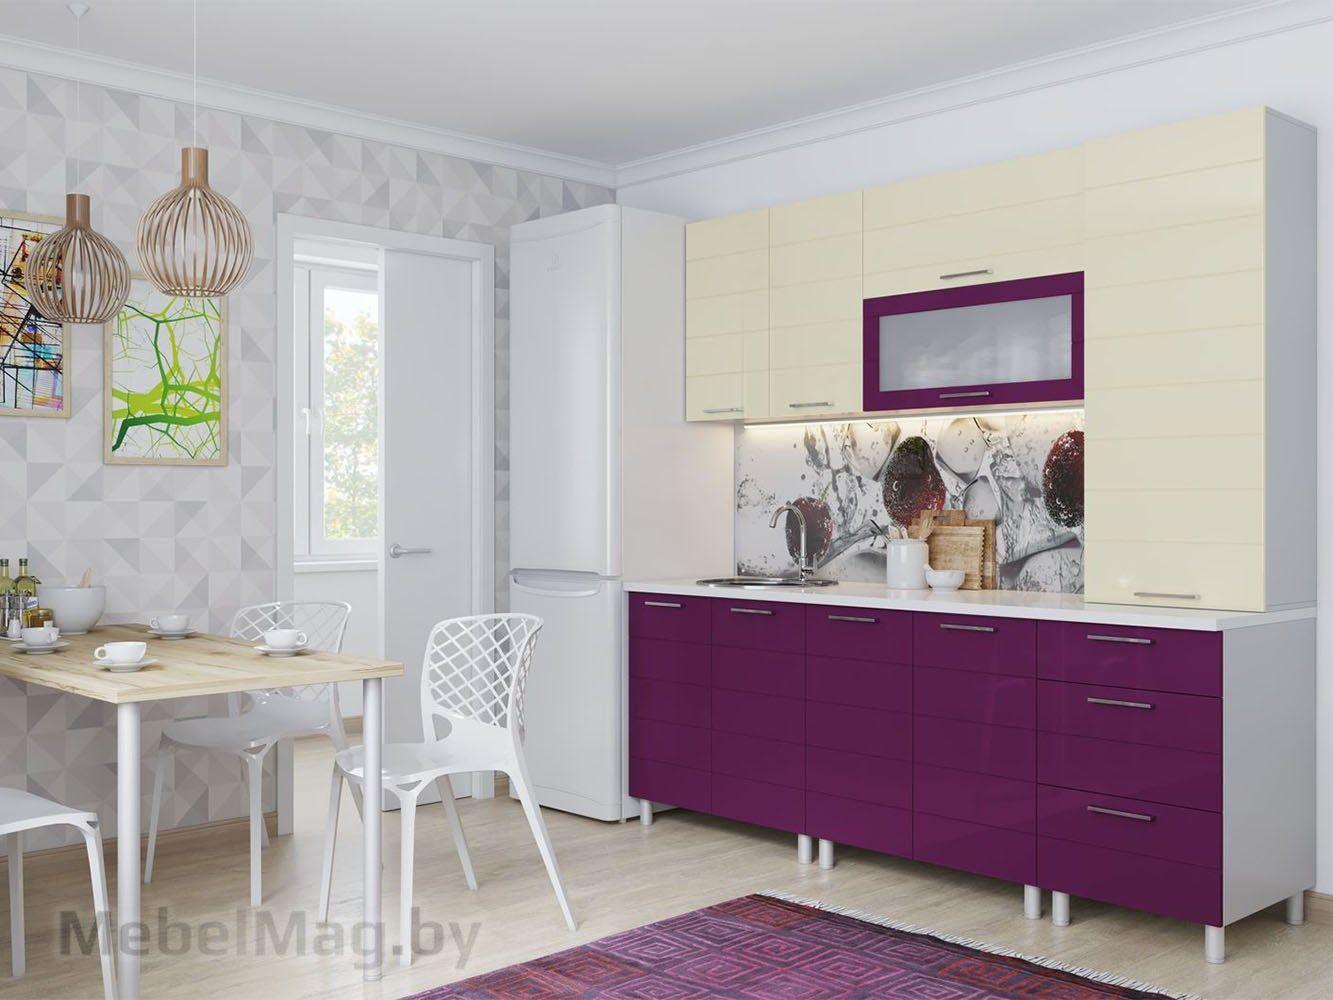 Кухня Лаура Ваниль/Баклажан (2,1м)